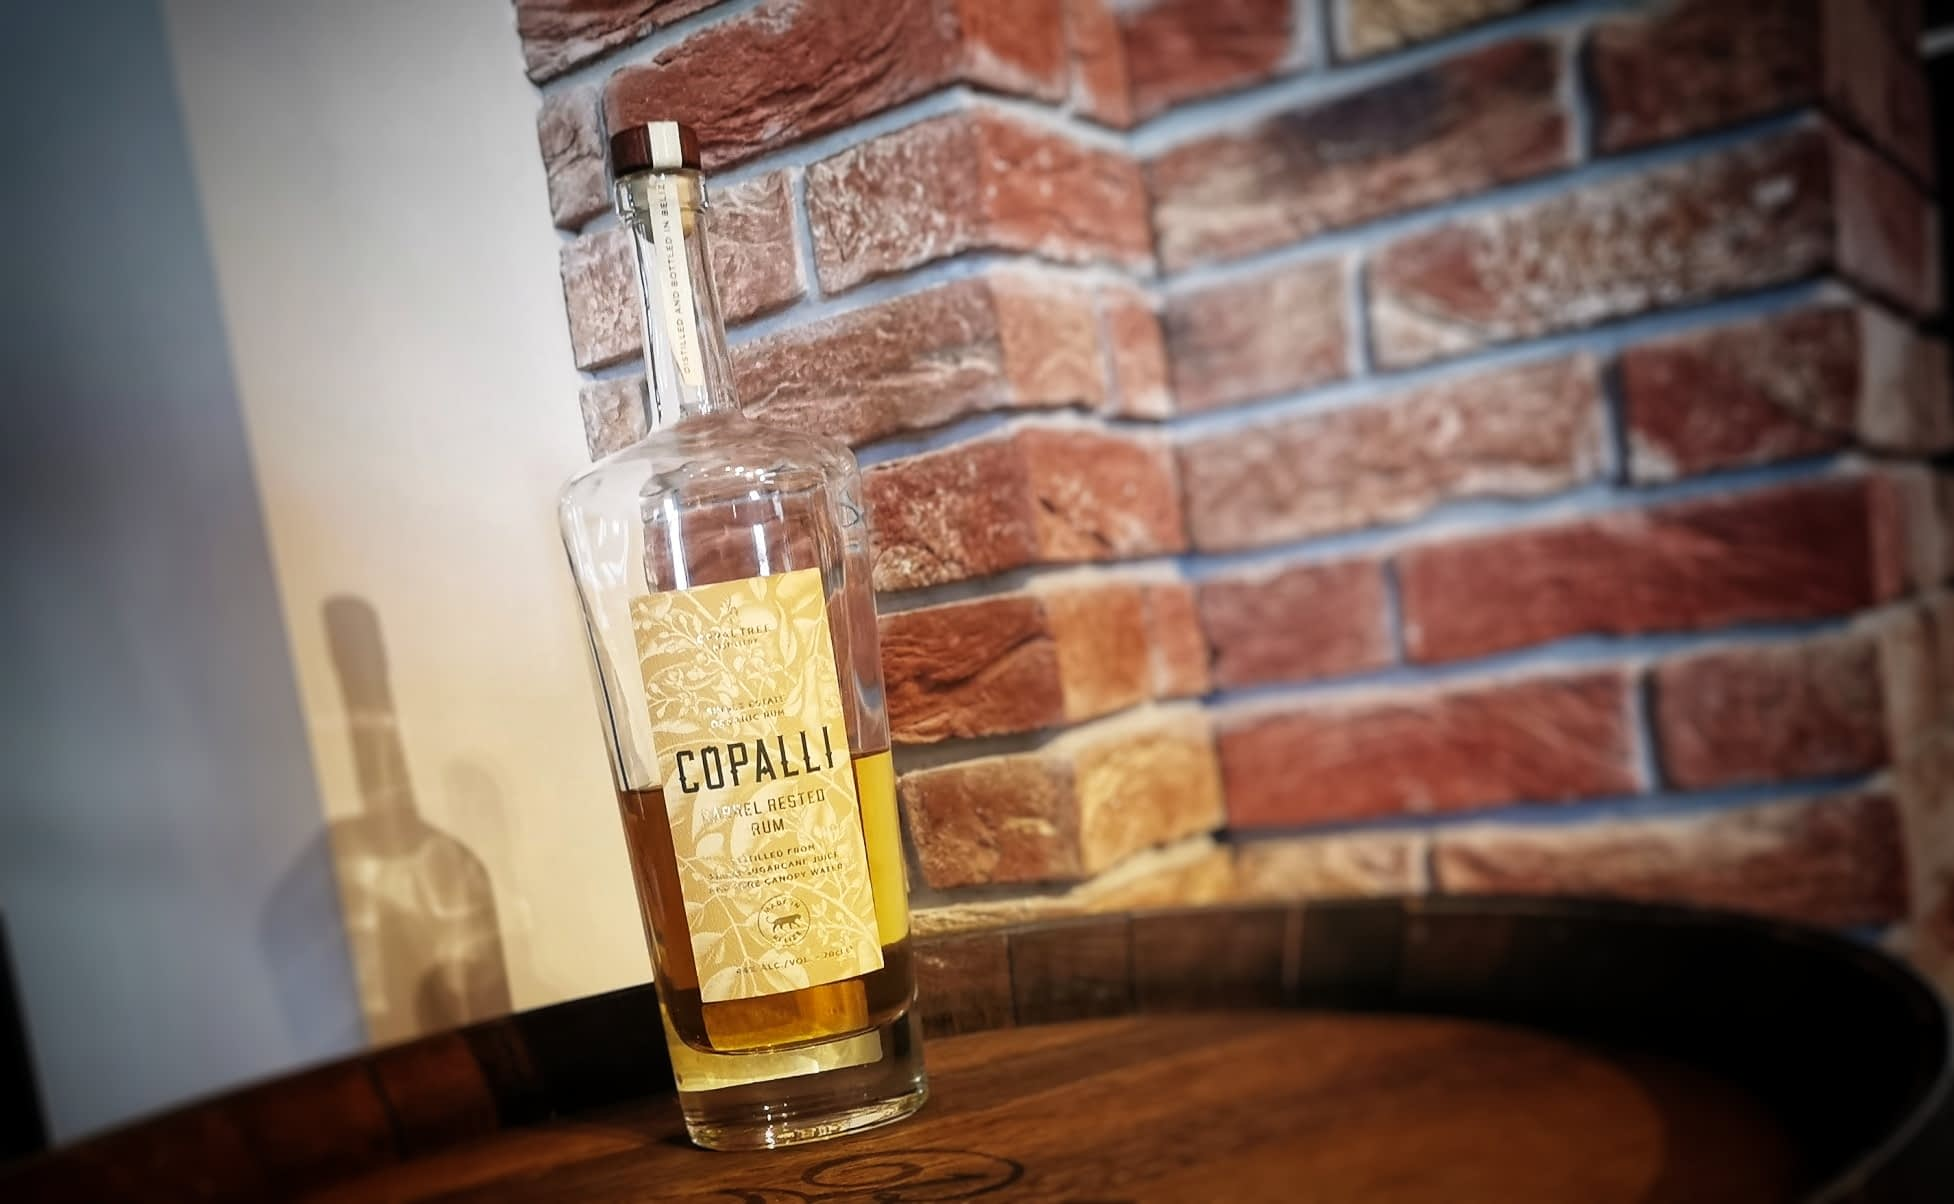 Copalli Barell rested